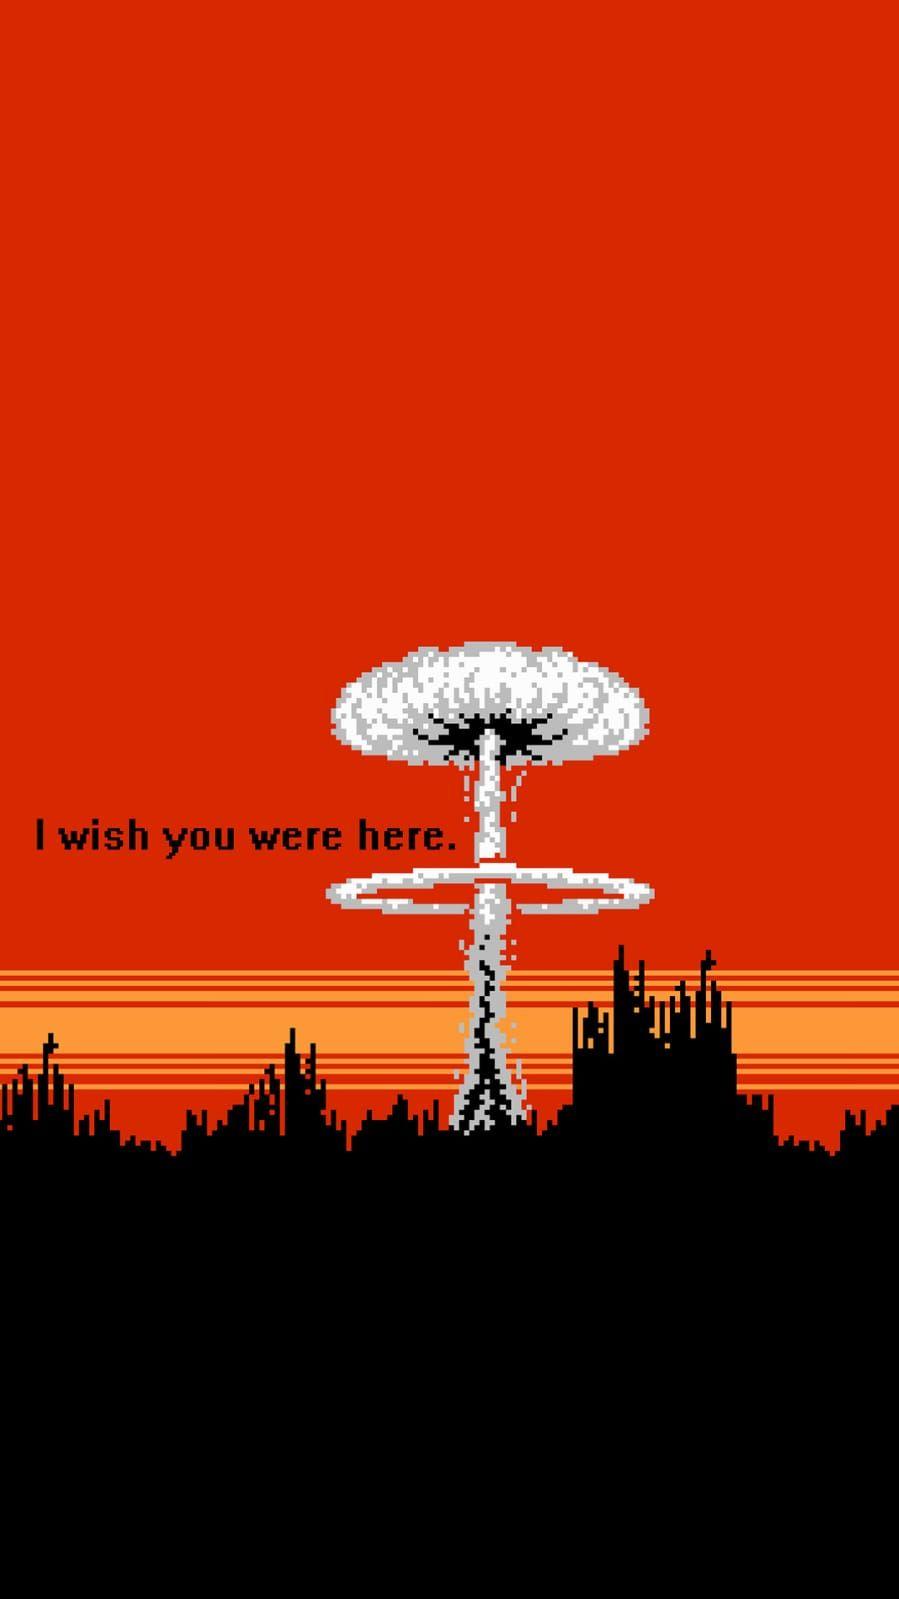 Wish You Were Here Aesthetic Wallpapers Art Wallpaper Vaporwave Art